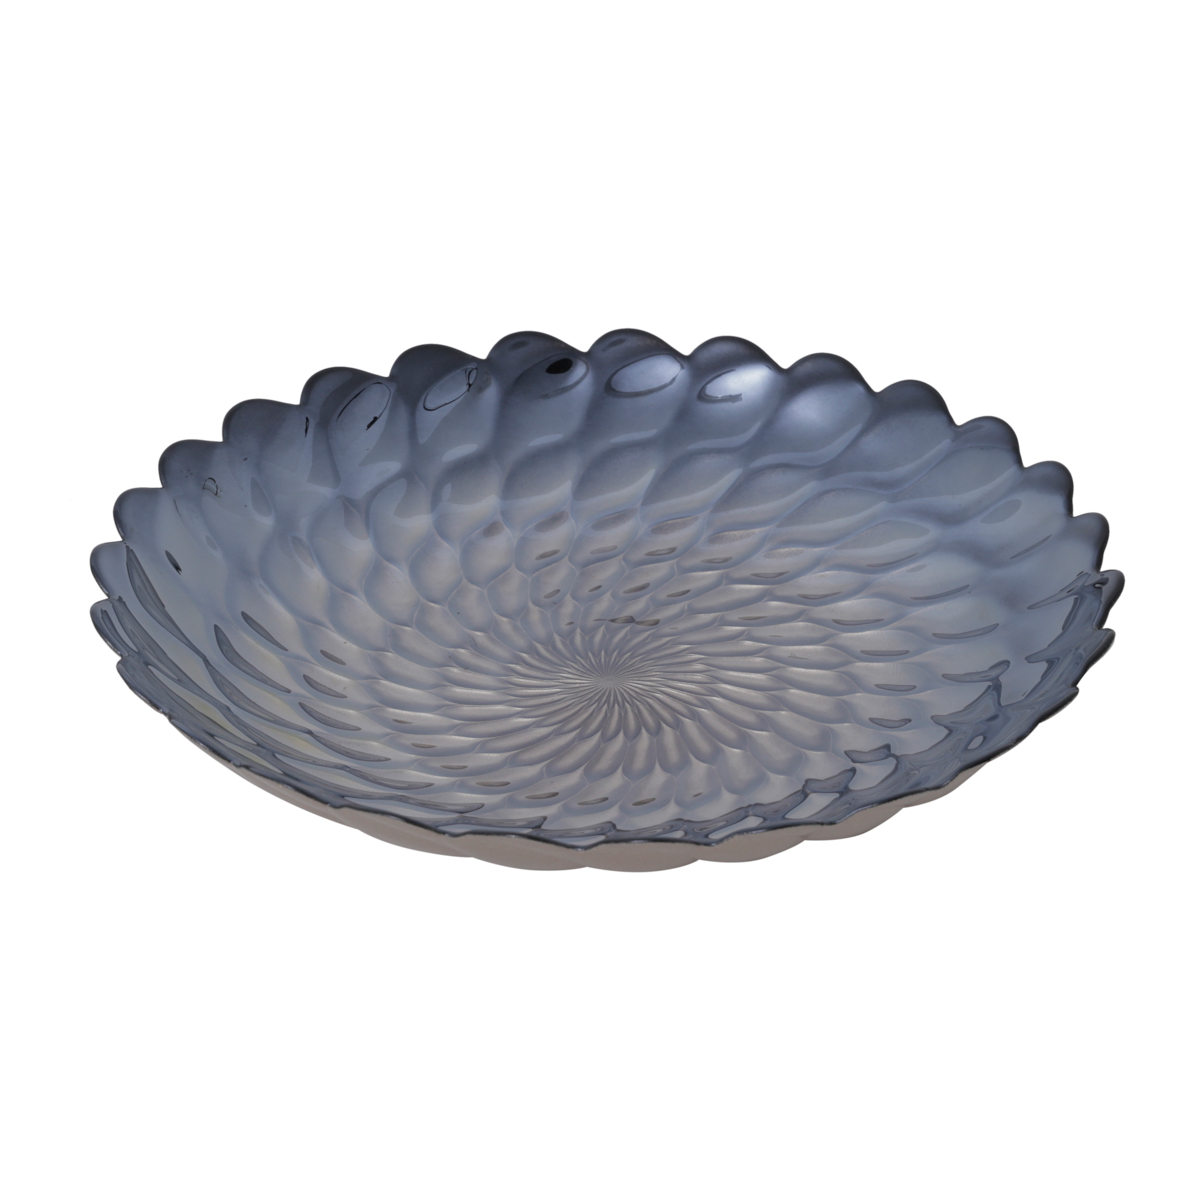 Centro de Mesa Decorativo de Vidro Belgravia Iris Luster 40 x 7 cm